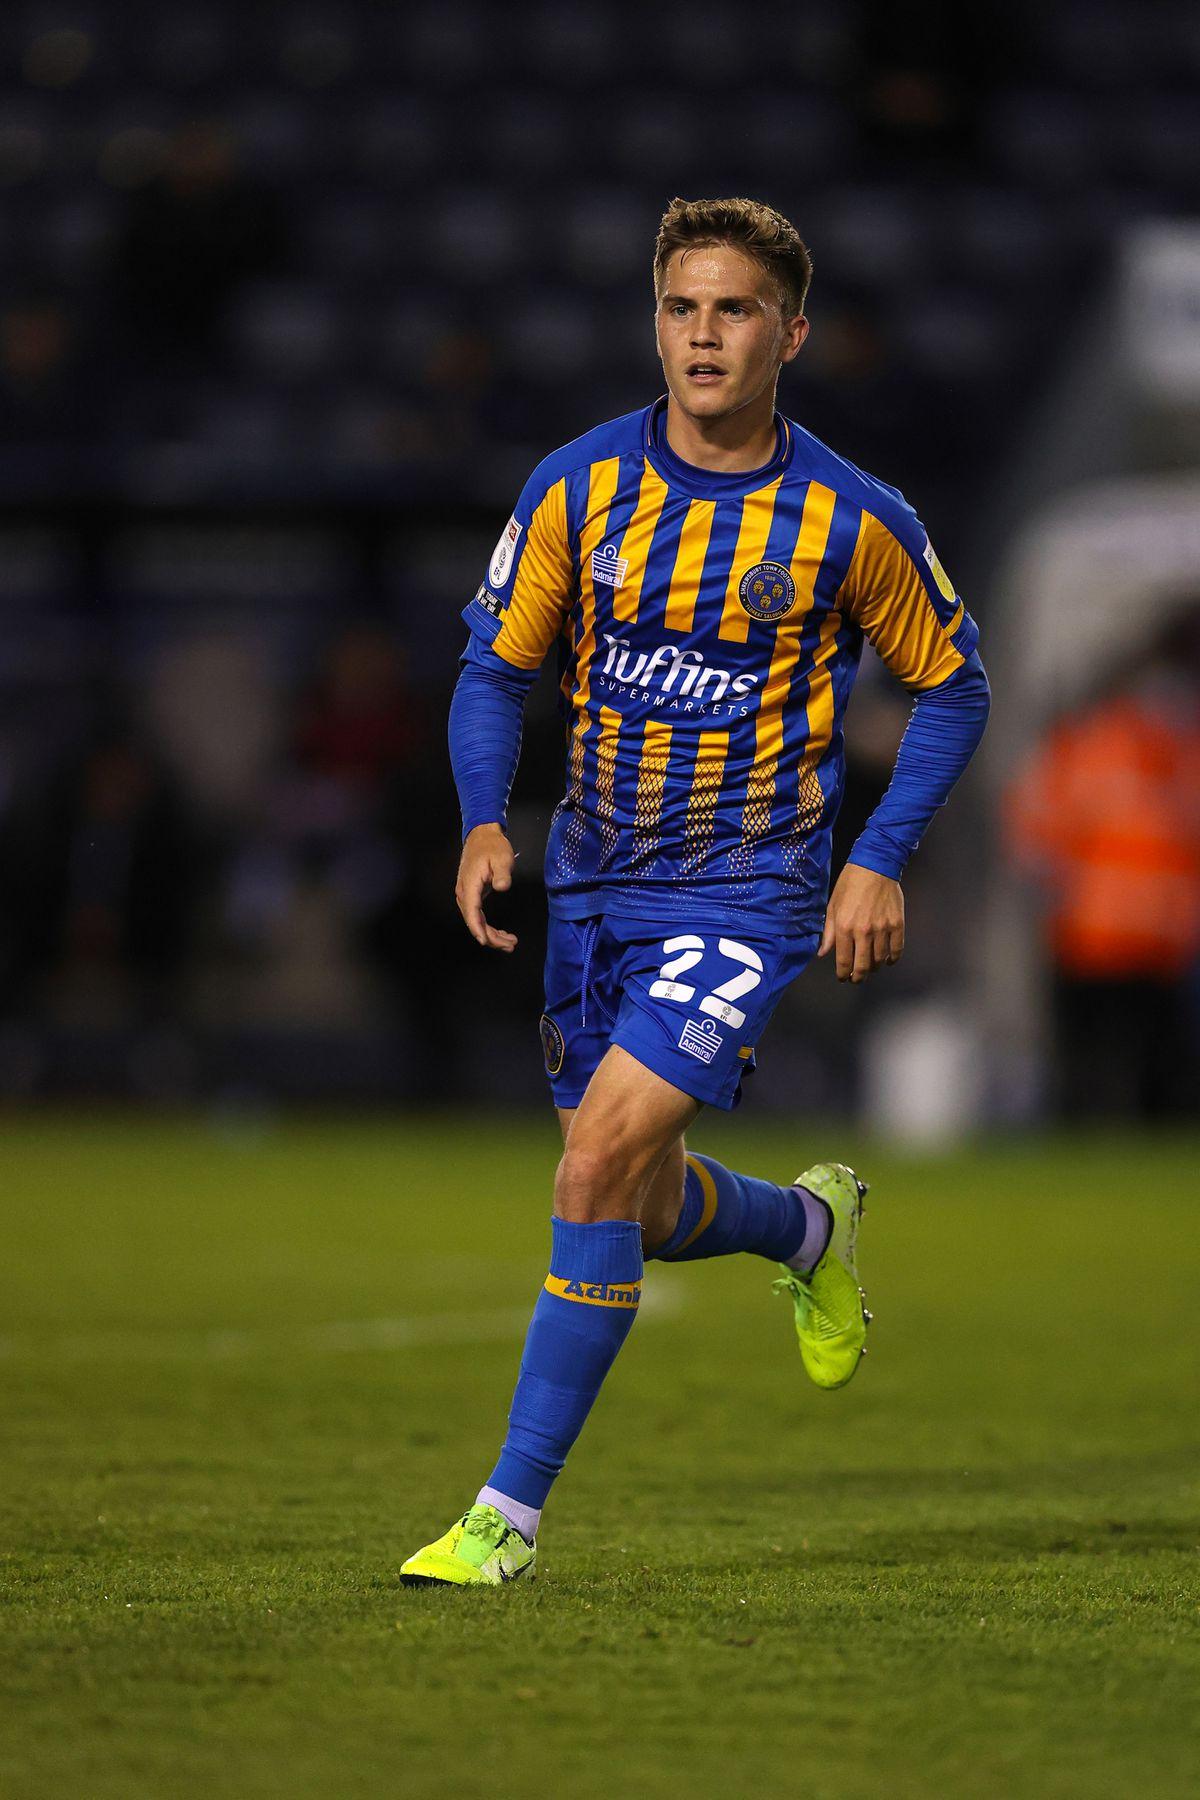 Josh Daniels of Shrewsbury Town.